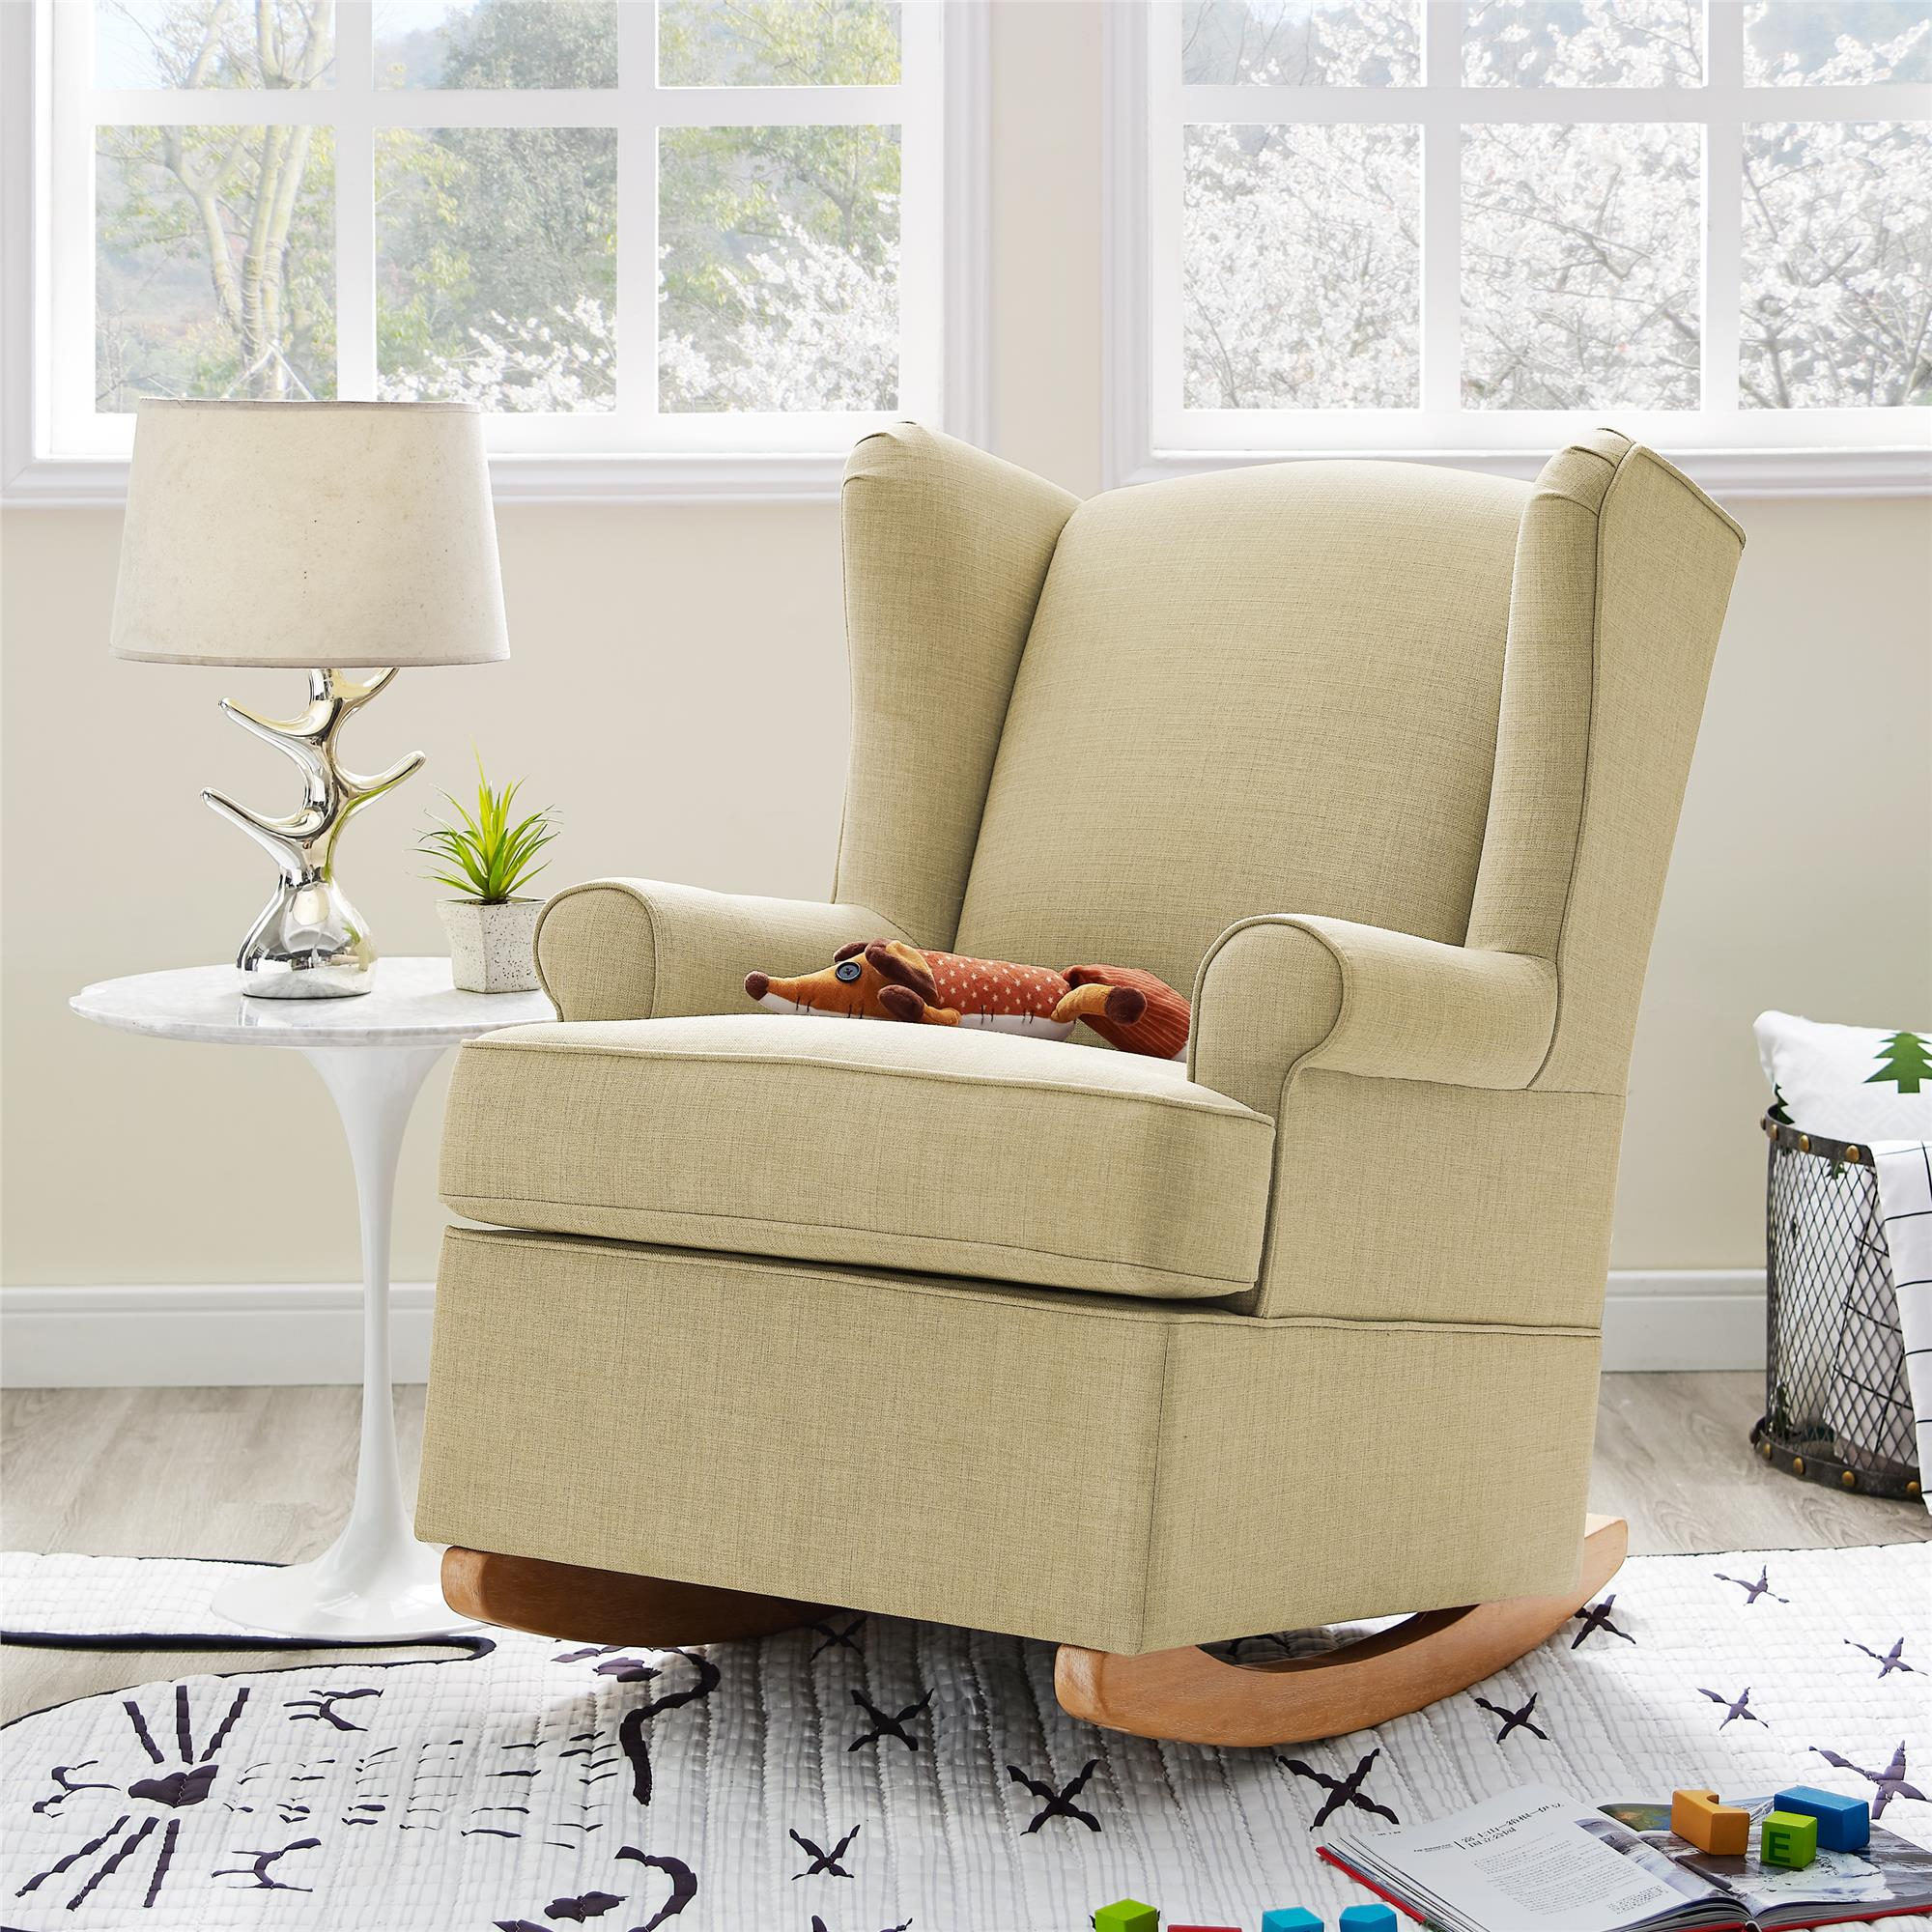 Dorel Living | Baby Relax Brennan Wingback Convertible Rocker, Beige Inside Brennan Sofa Chairs (View 23 of 25)